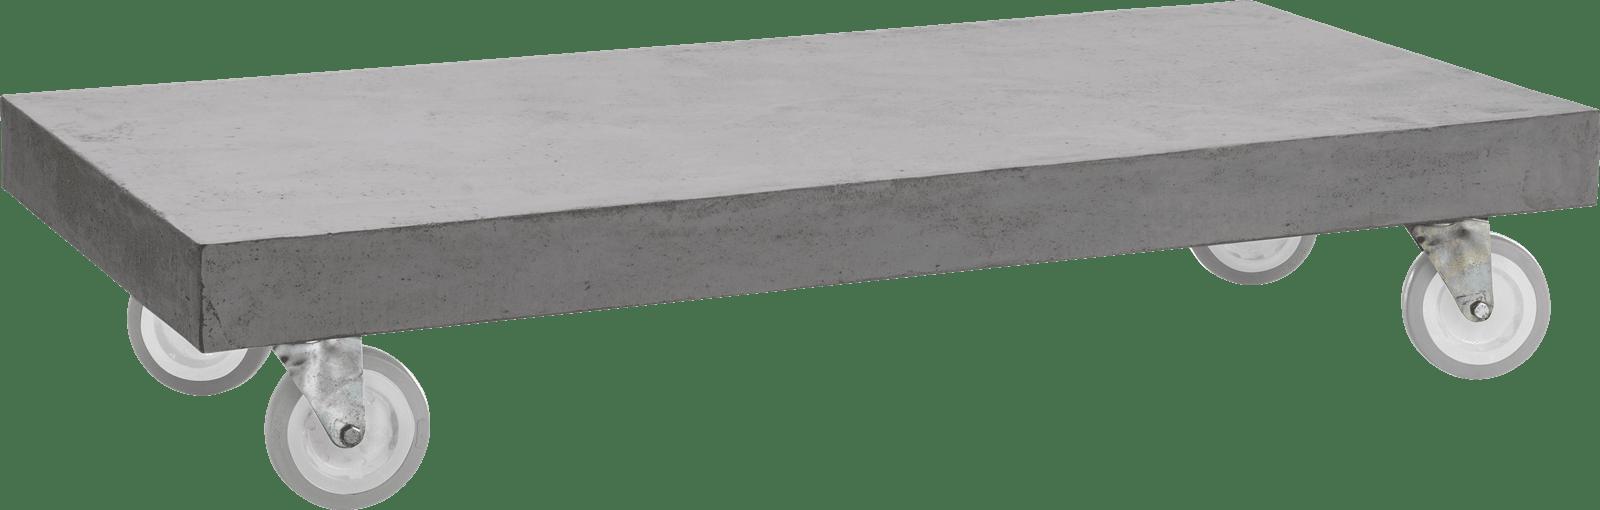 Toro - salontafel 120 x 60 cm